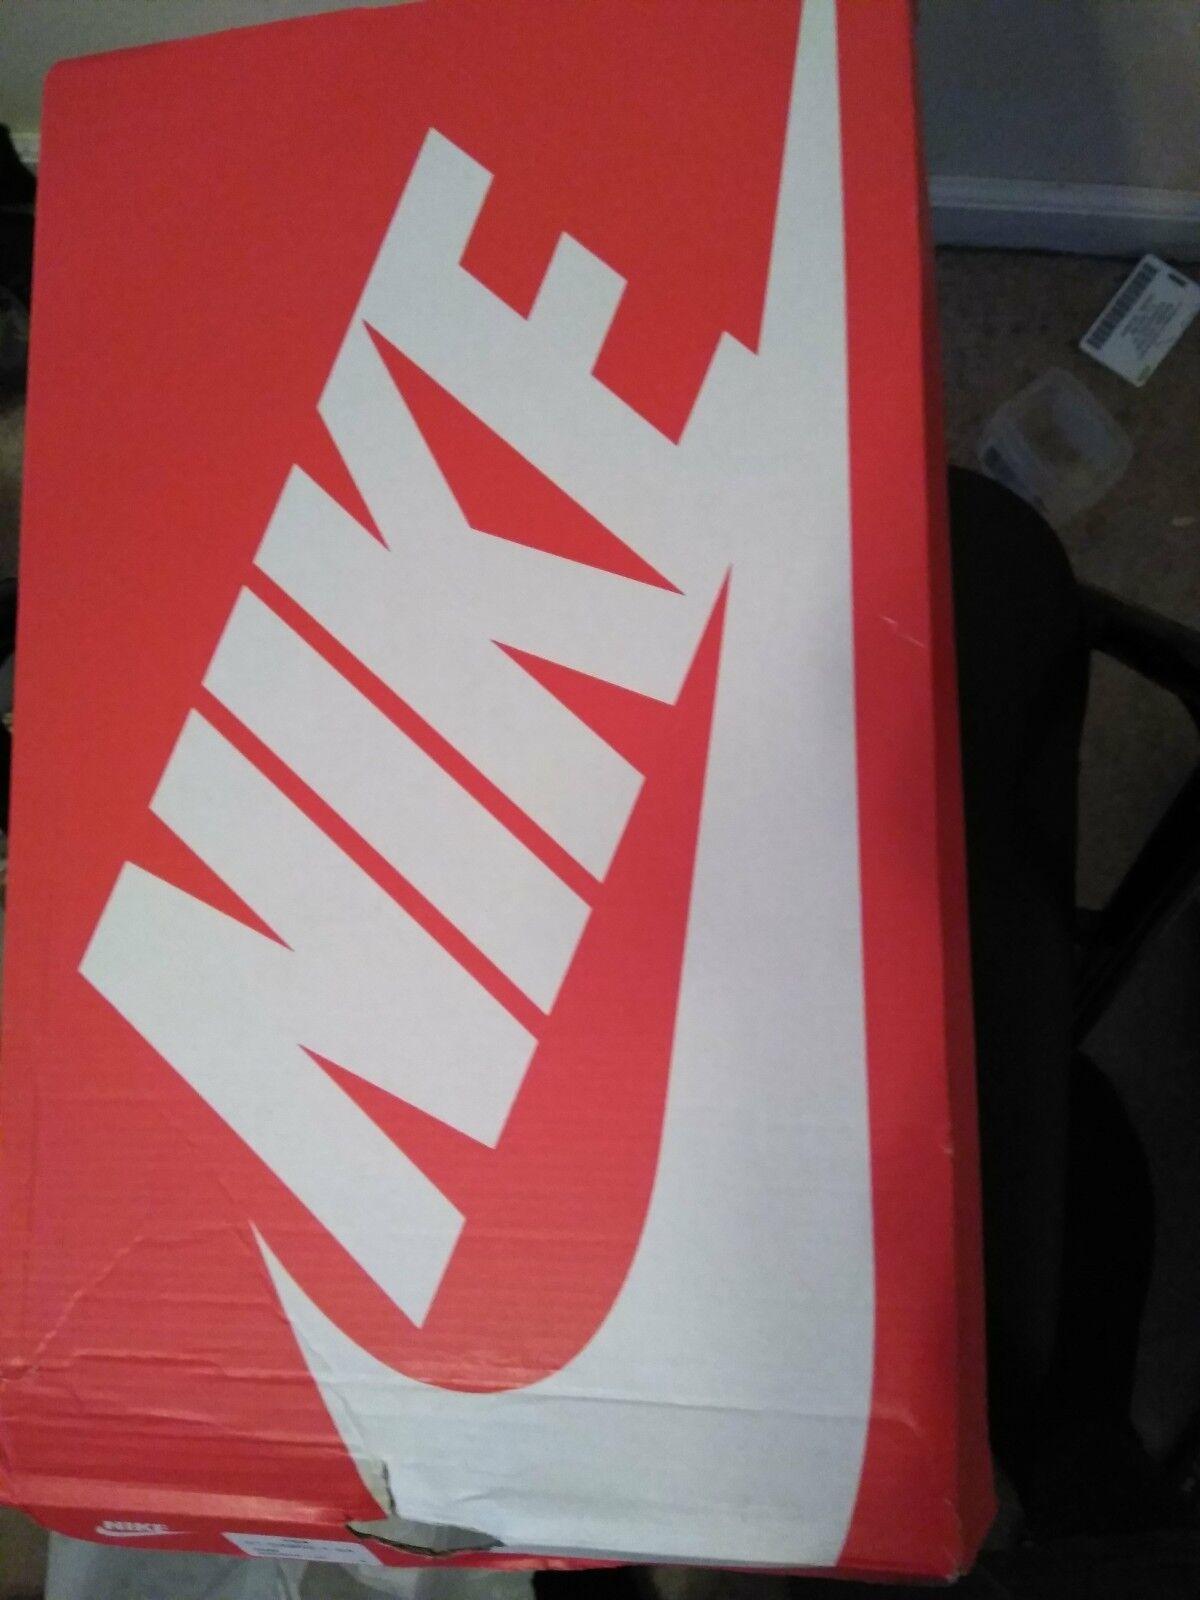 NIKE AIR MAX 2 UPTEMPO 94 White Size 13 922934-100